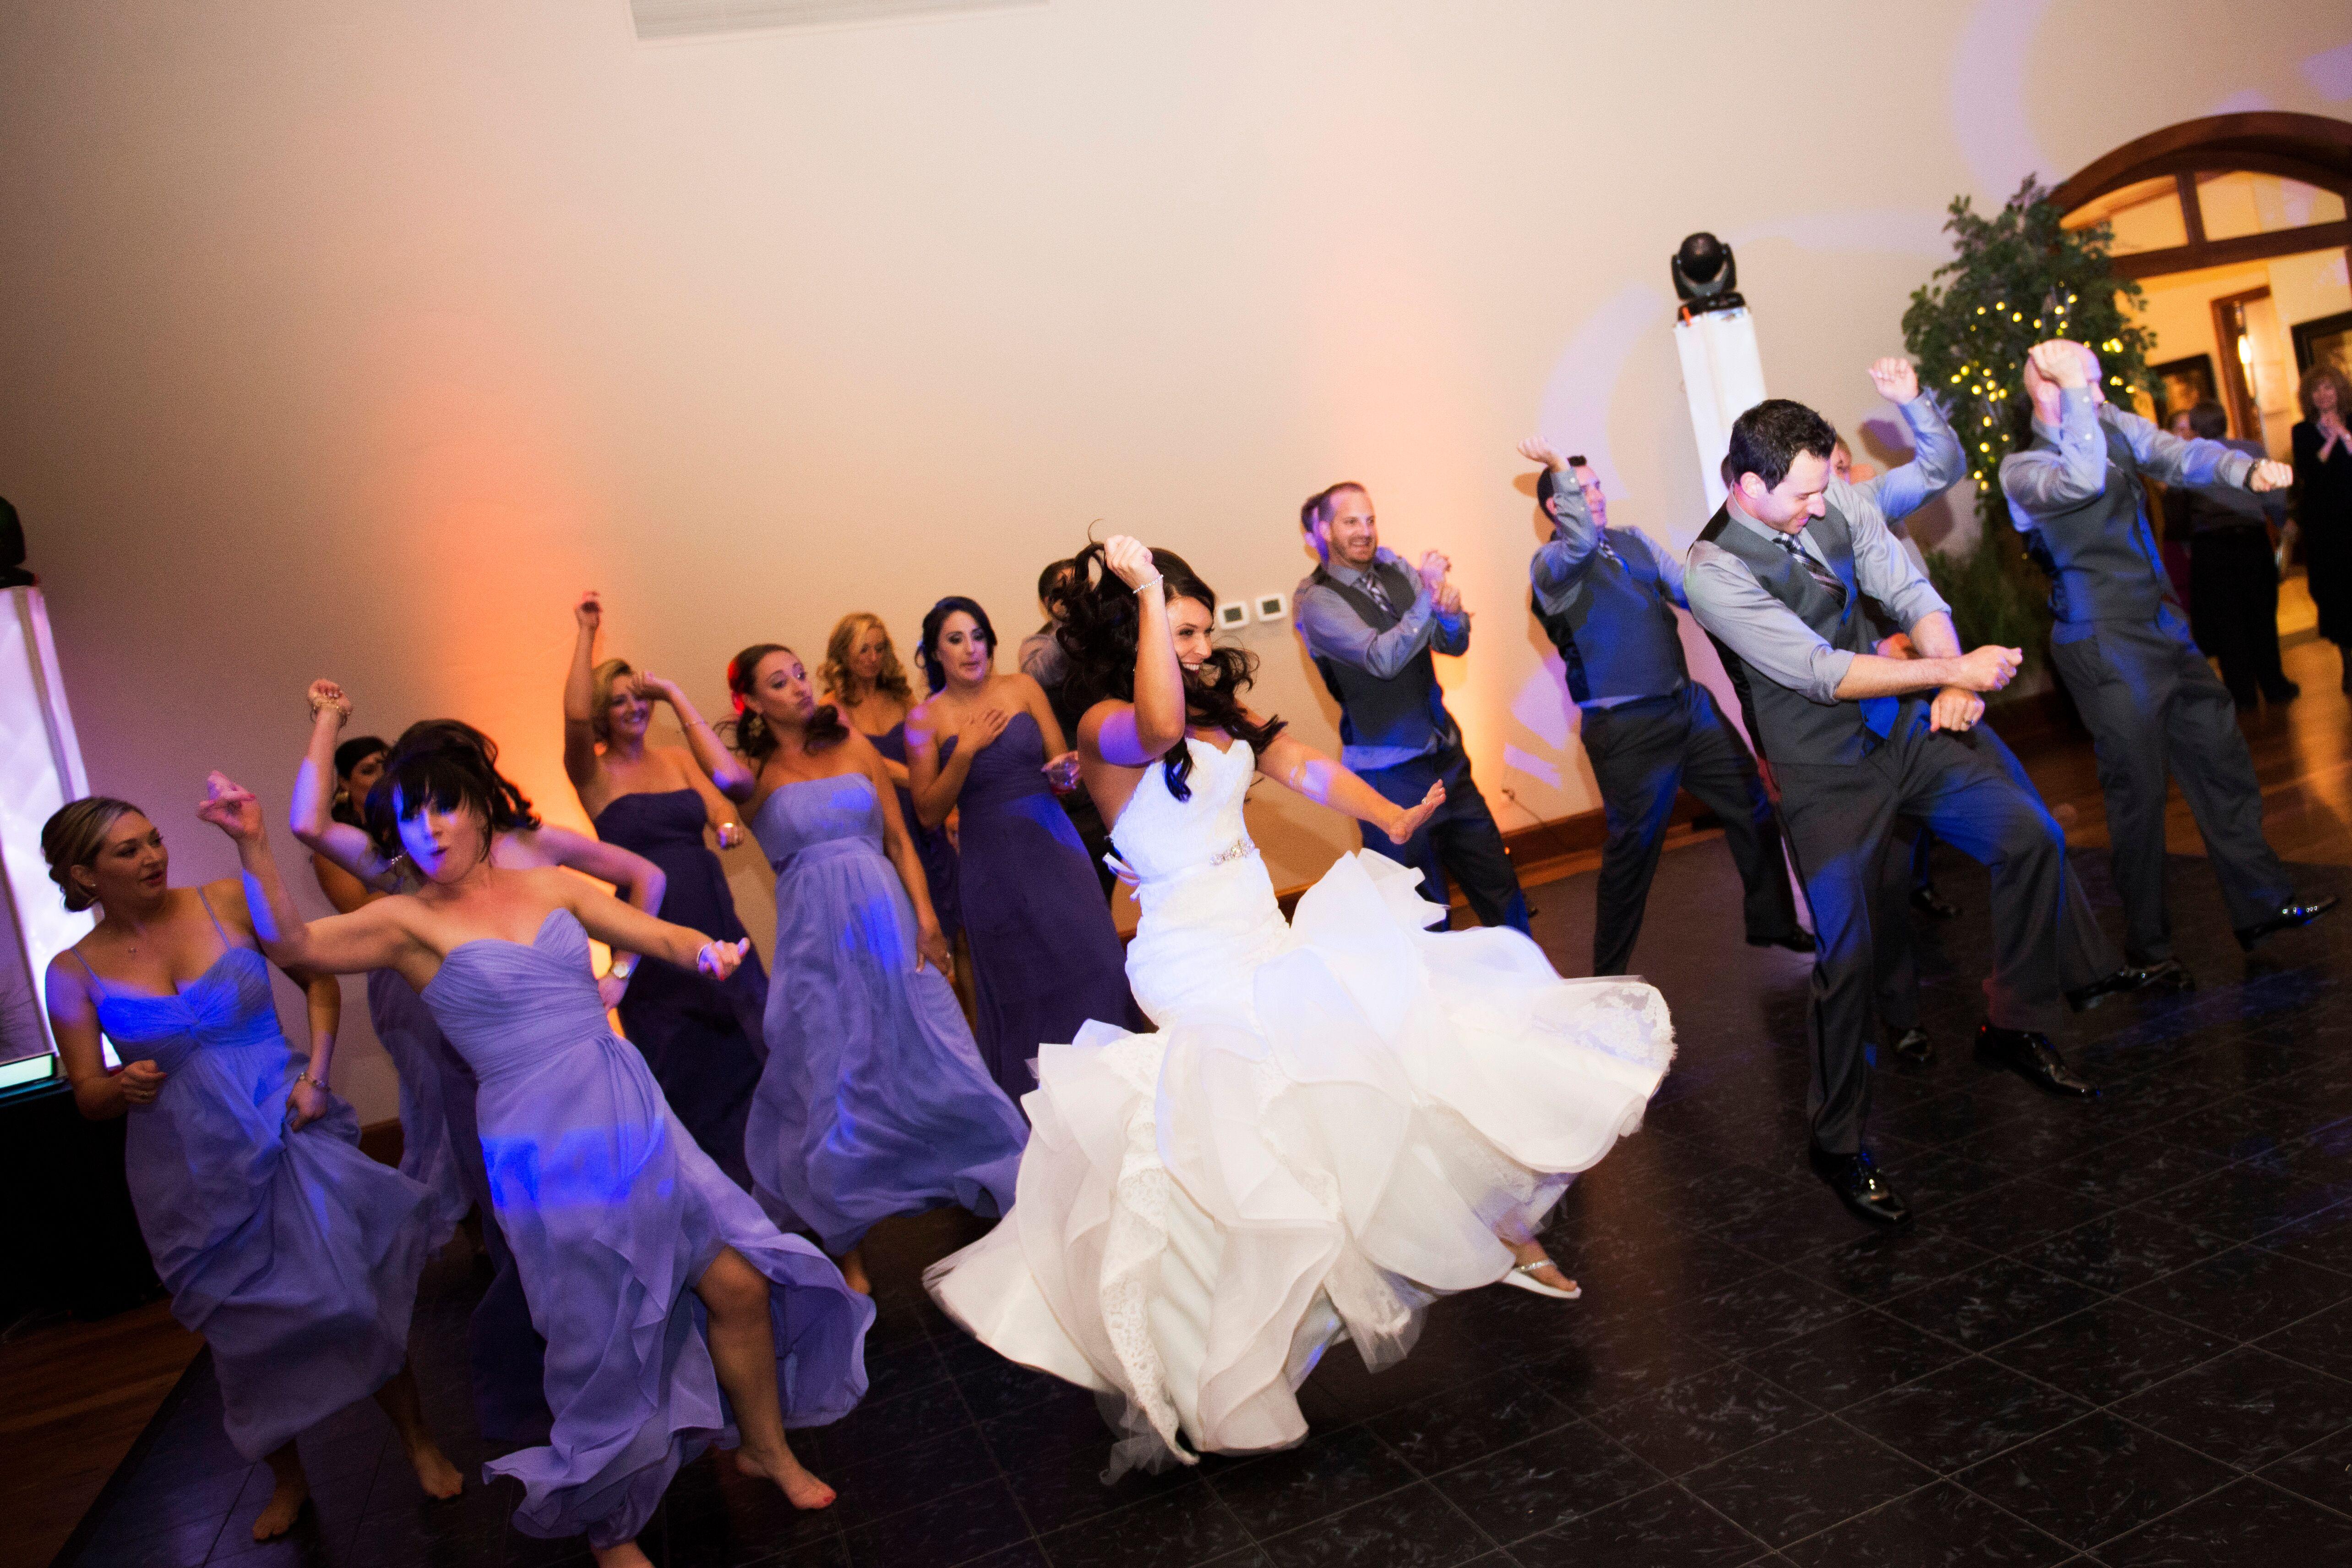 Wedding Party Flash Mob Dance